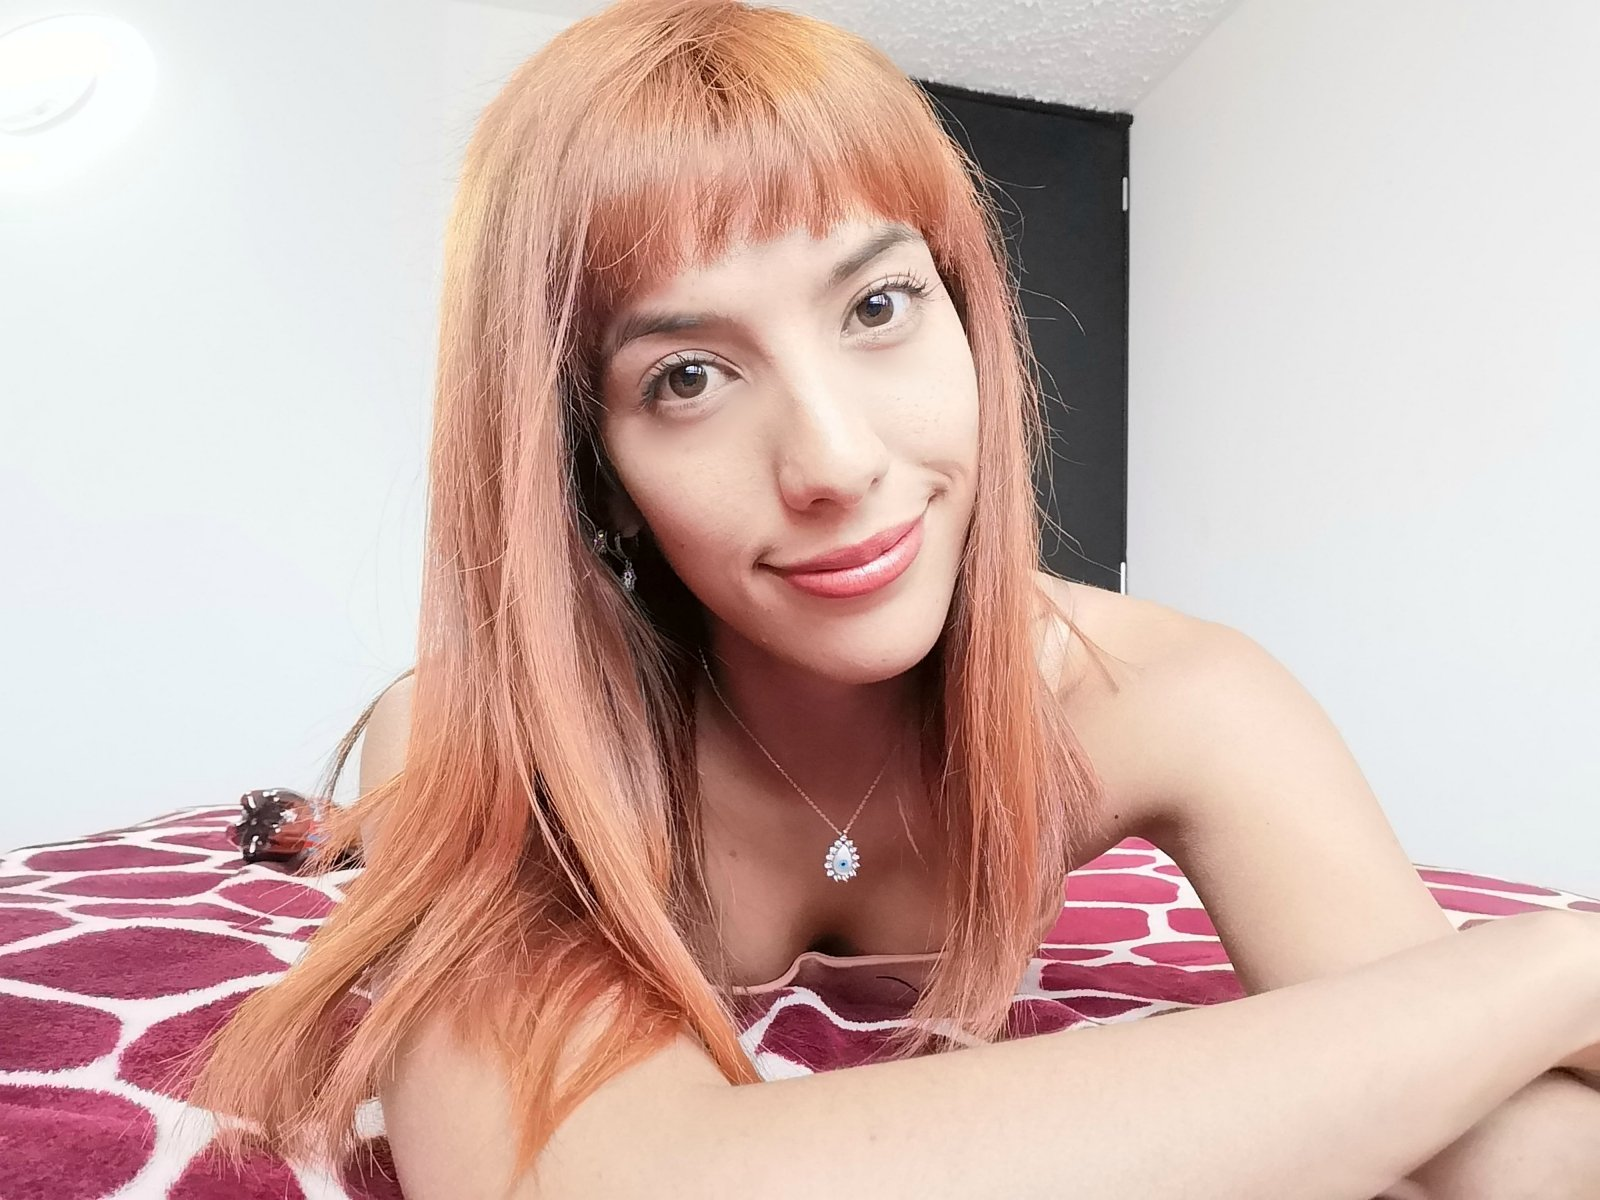 Sexyredrosex